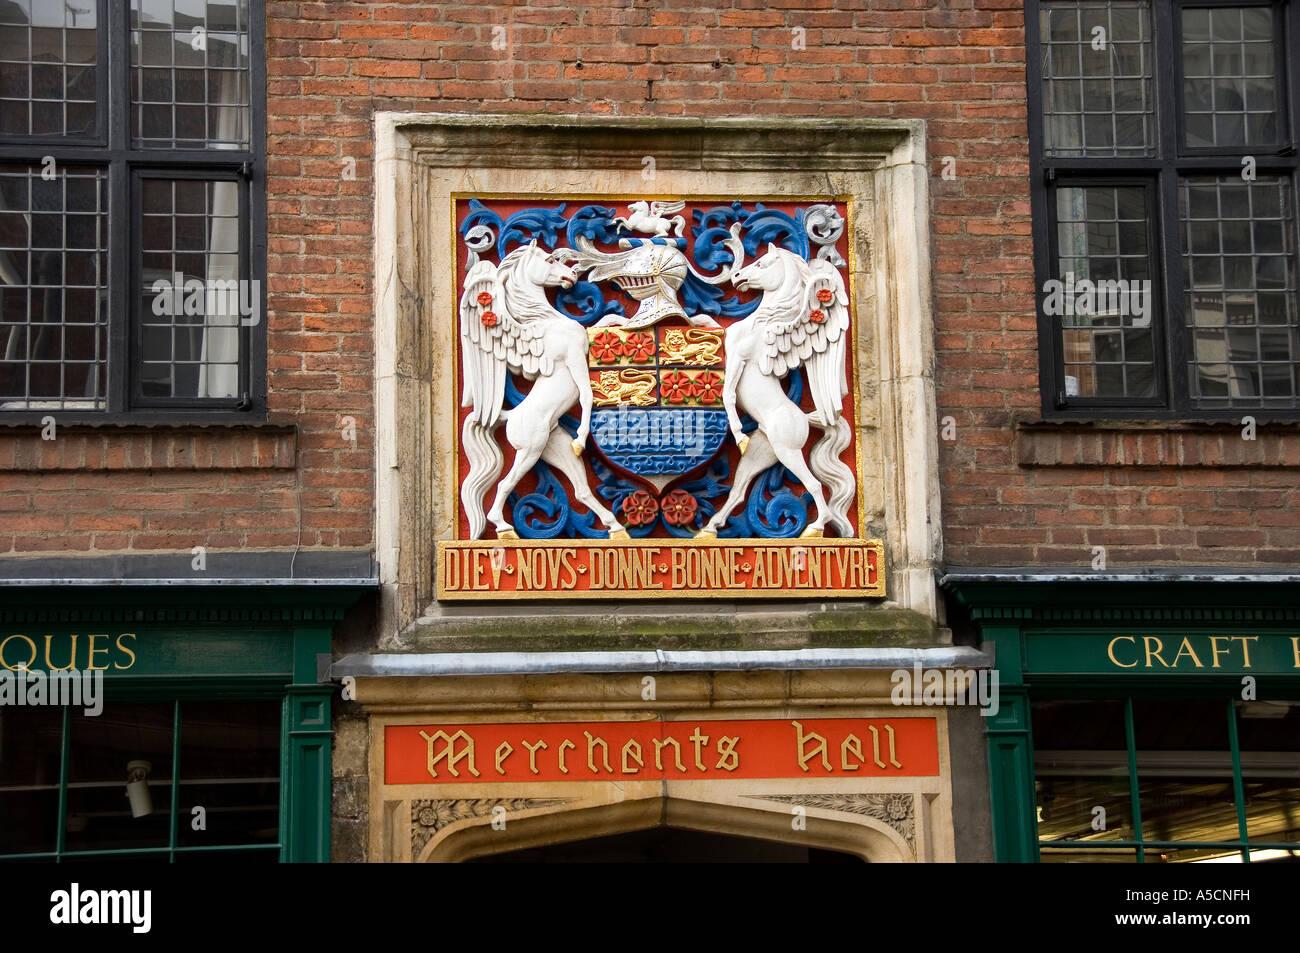 Merchant Adventurers Hall Fossgate York North Yorkshire England UK United Kingdom GB Great Britain - Stock Image